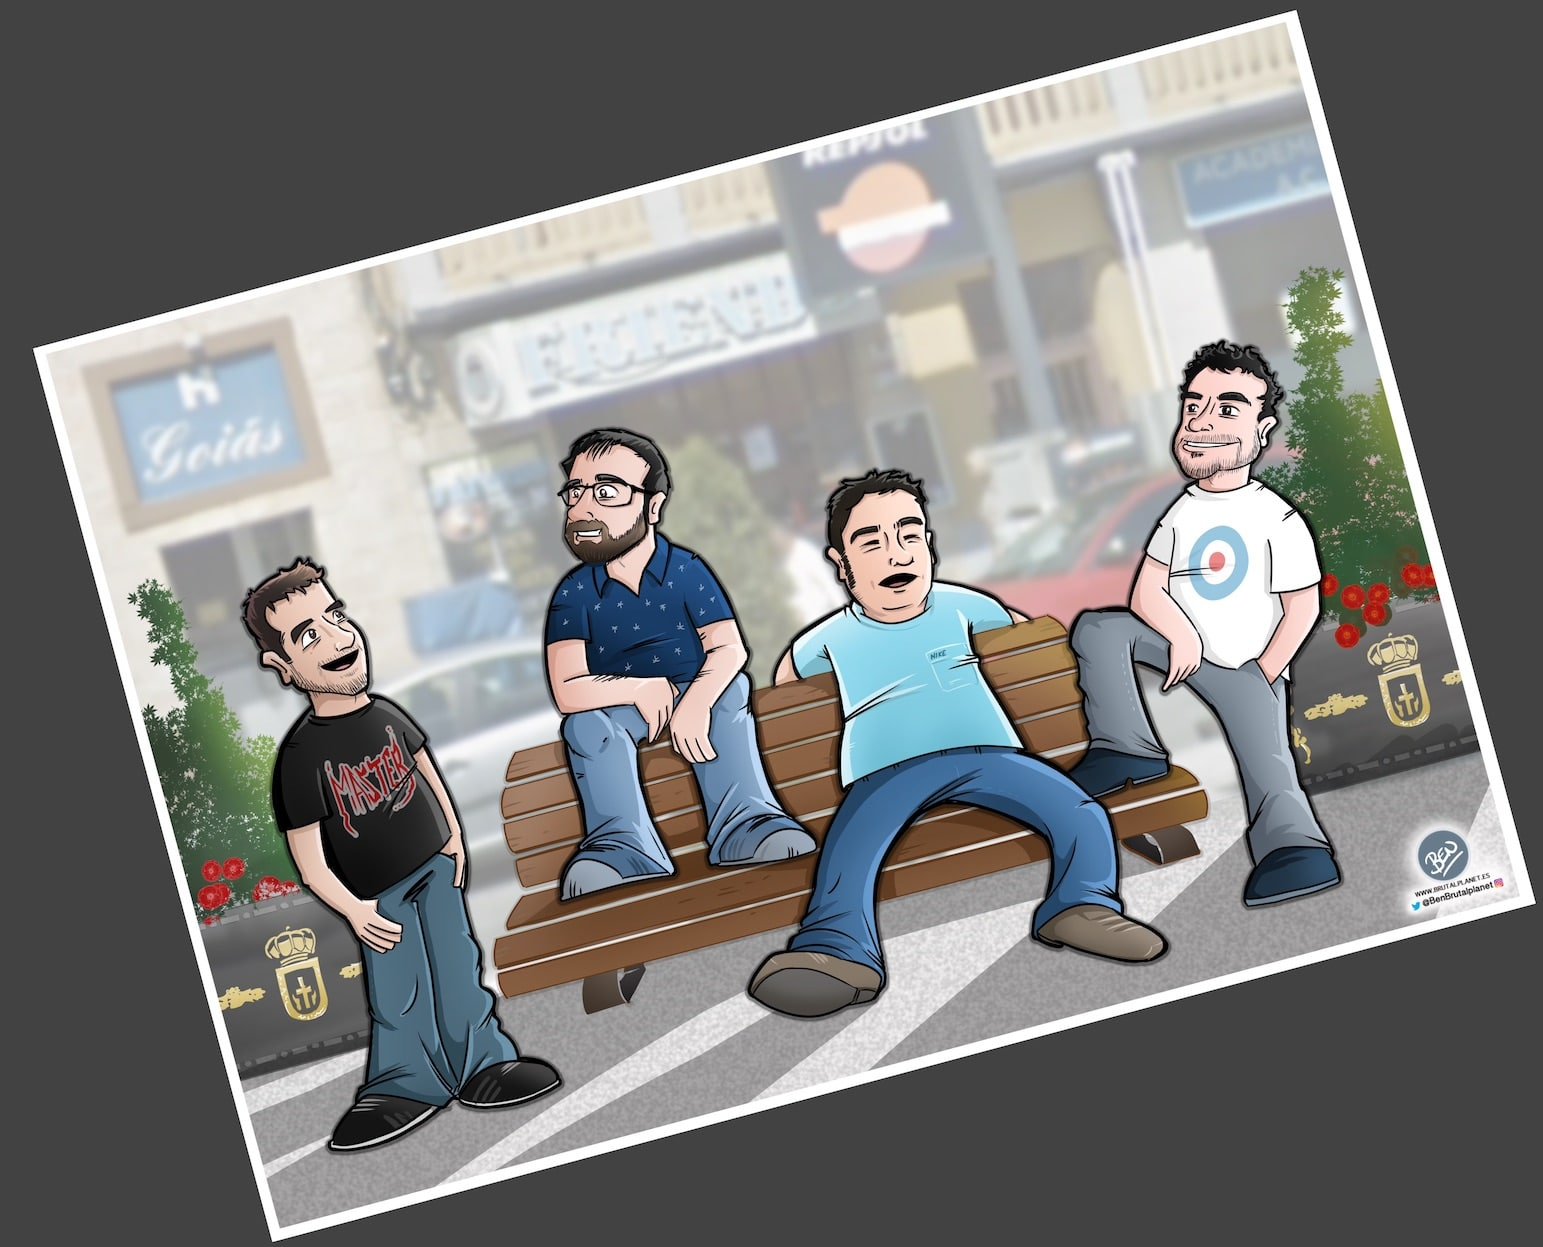 Caricatura Personalizada - Waiting on a Friend (Caricatura grupo de amigos) - tuvidaencomic.com - 4